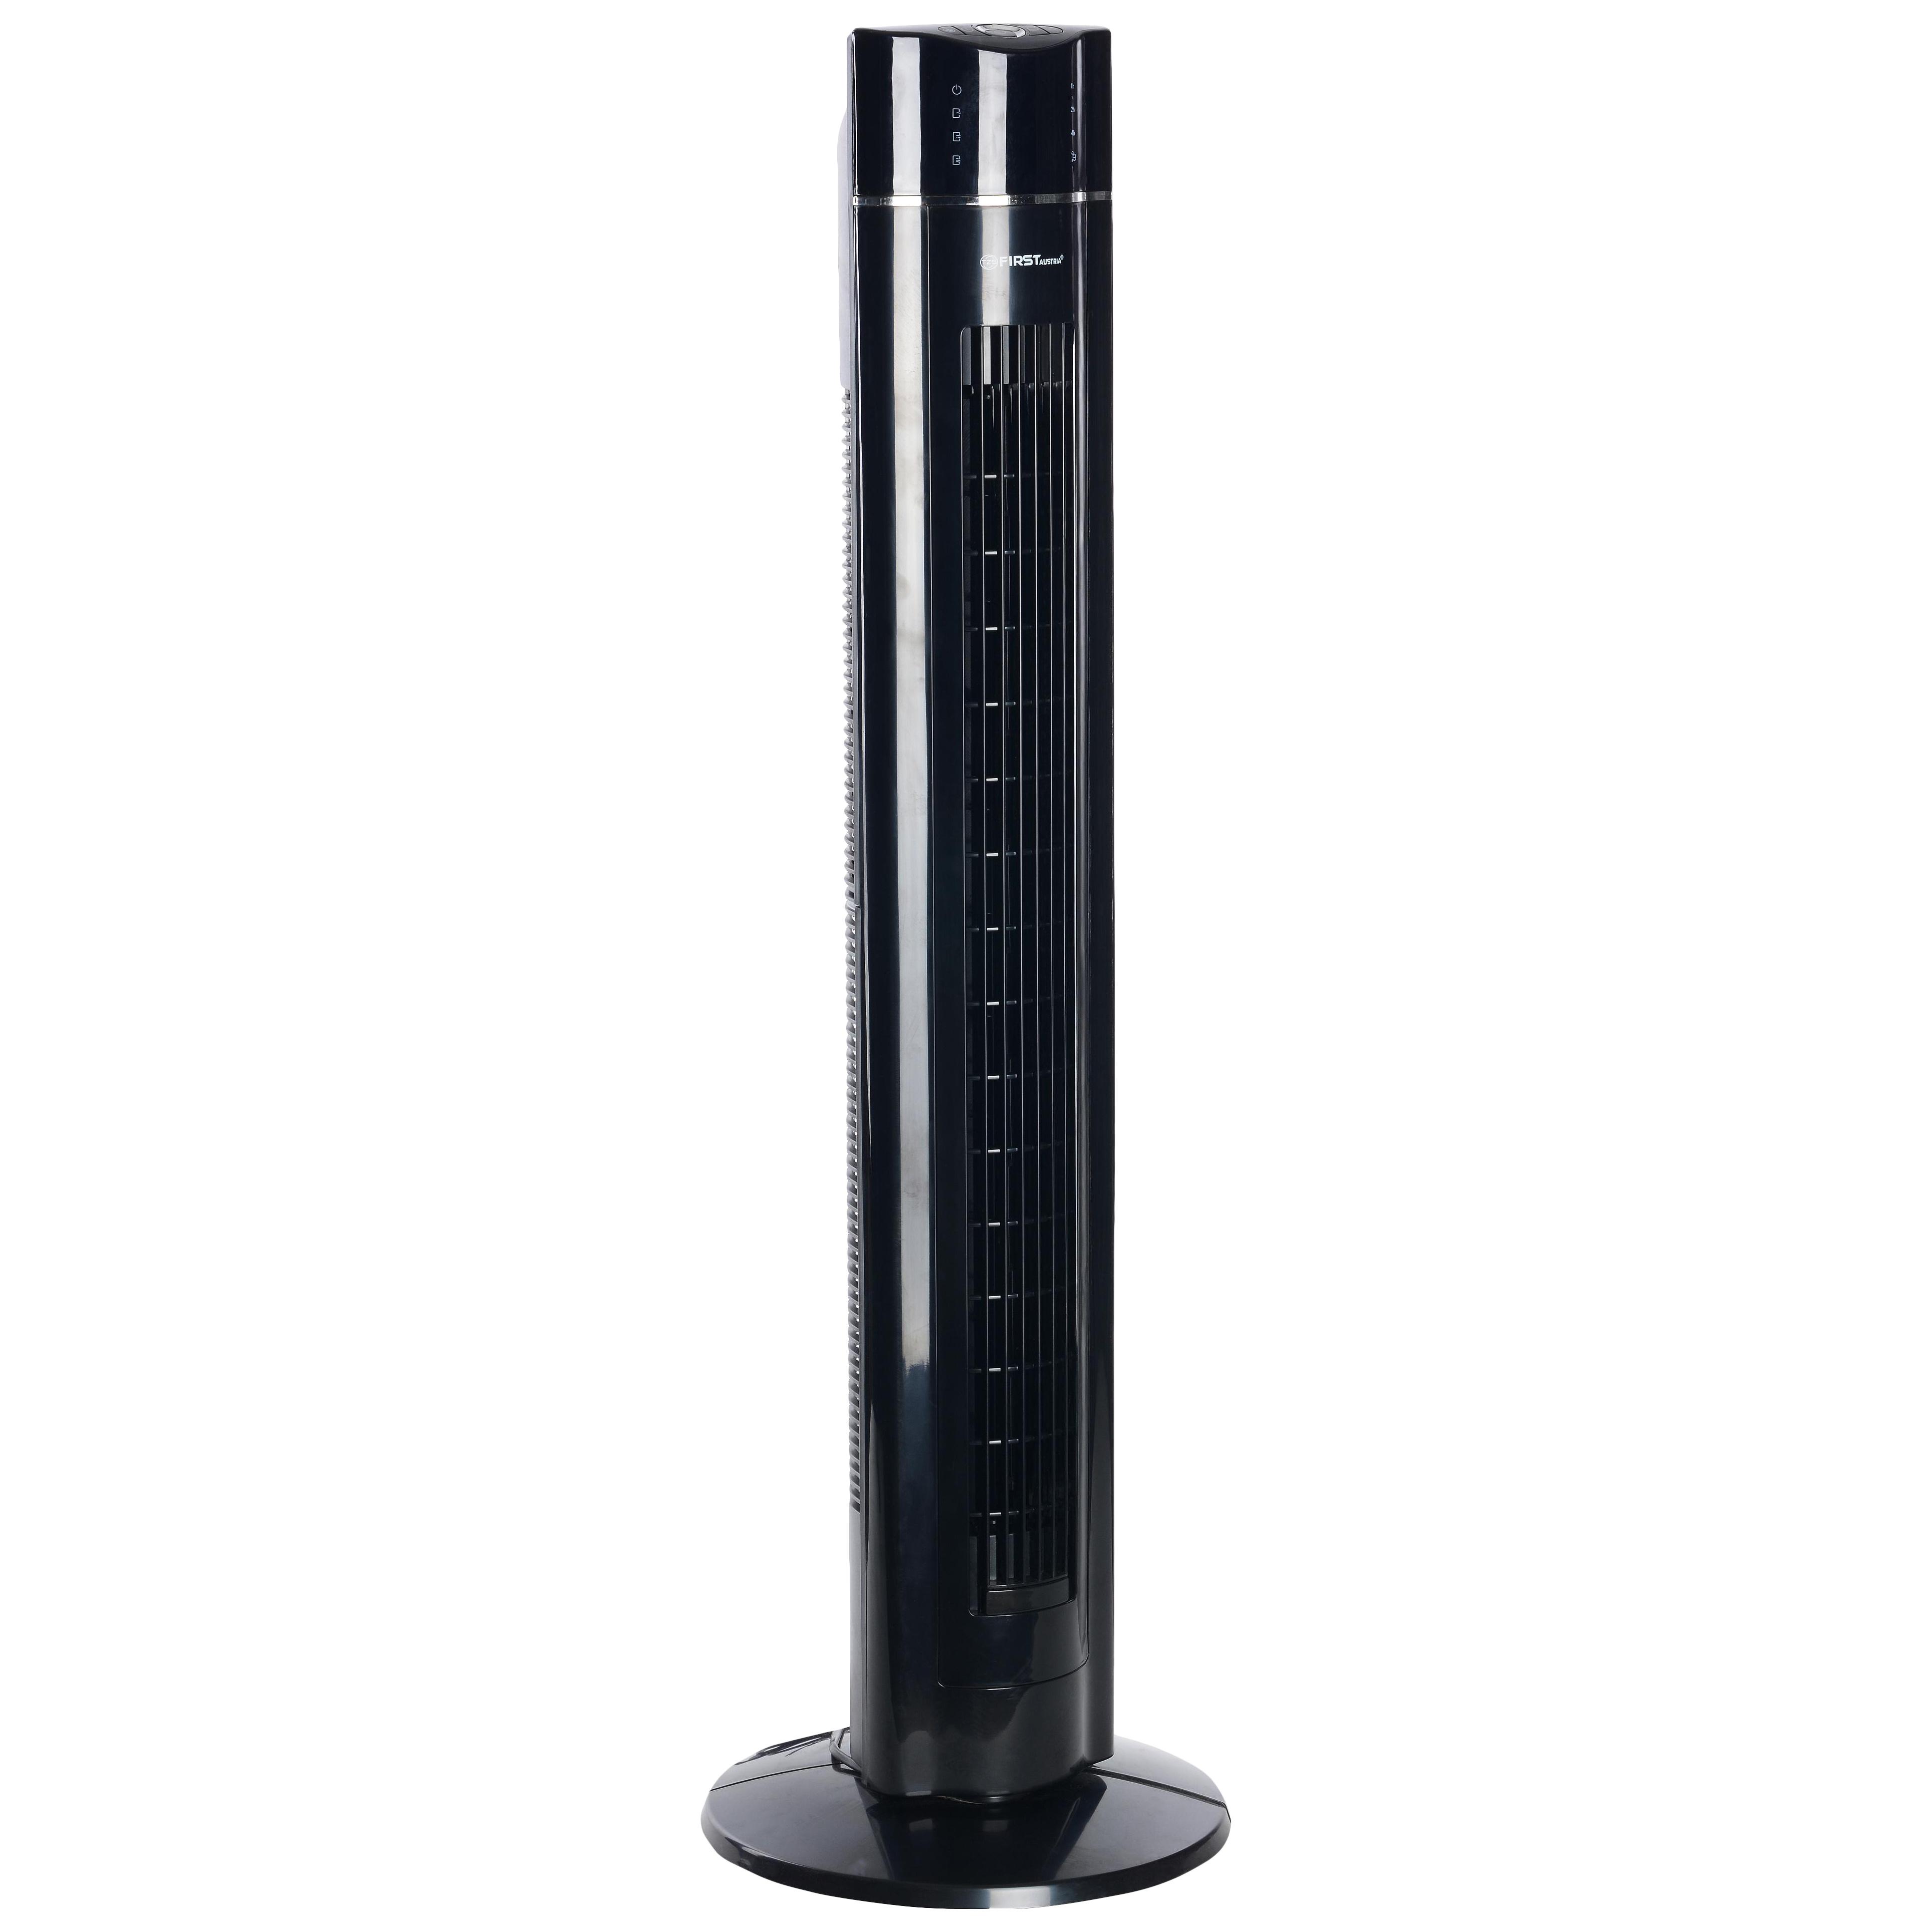 Вентилятор колонный First FA 5560 2 black